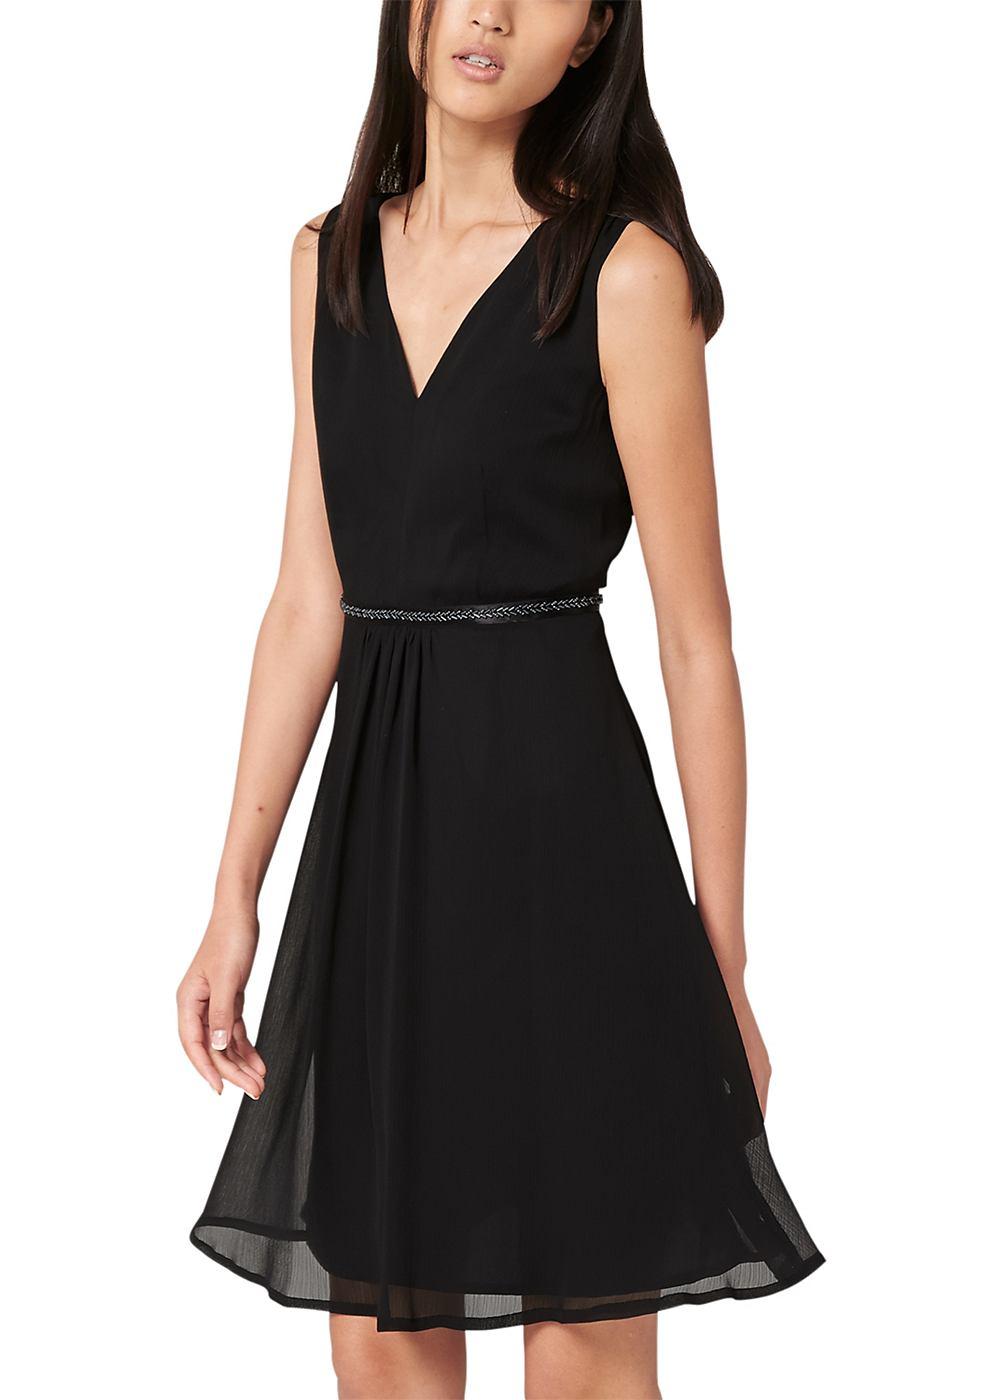 s.Oliver Premium chiffon jurk met geaccentueerde taille zwart